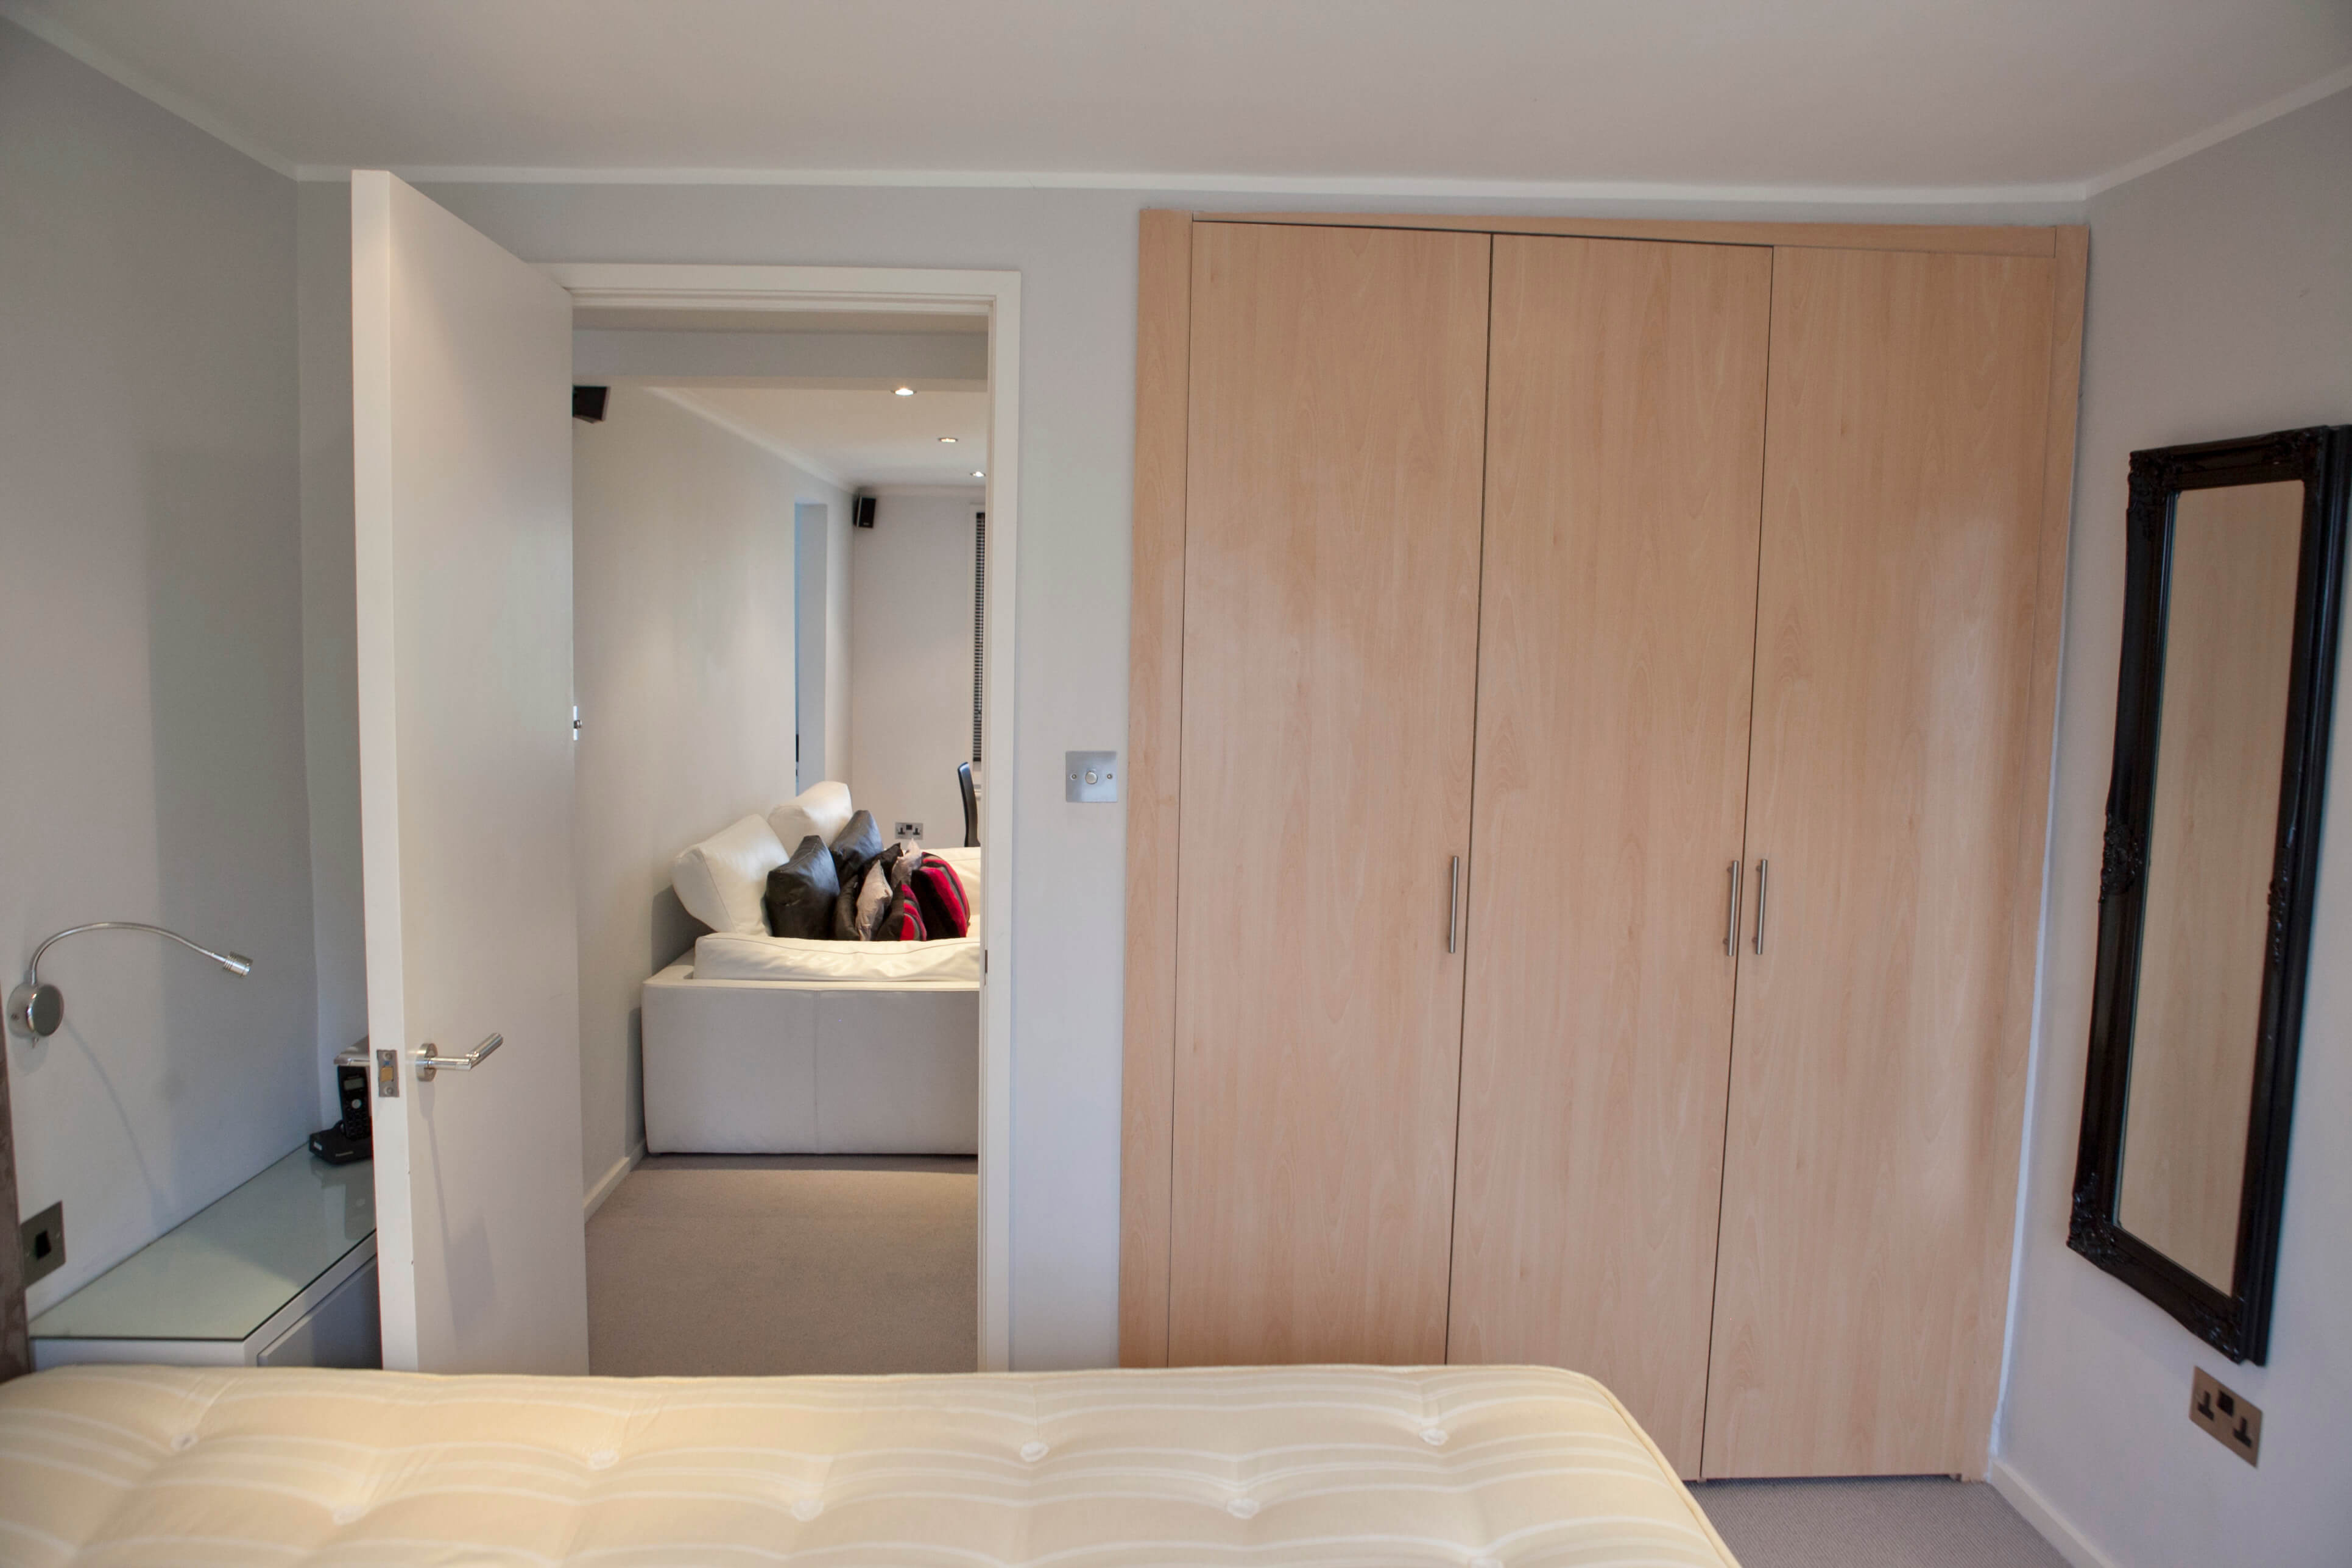 IMG 31301 - Flats & Apartments